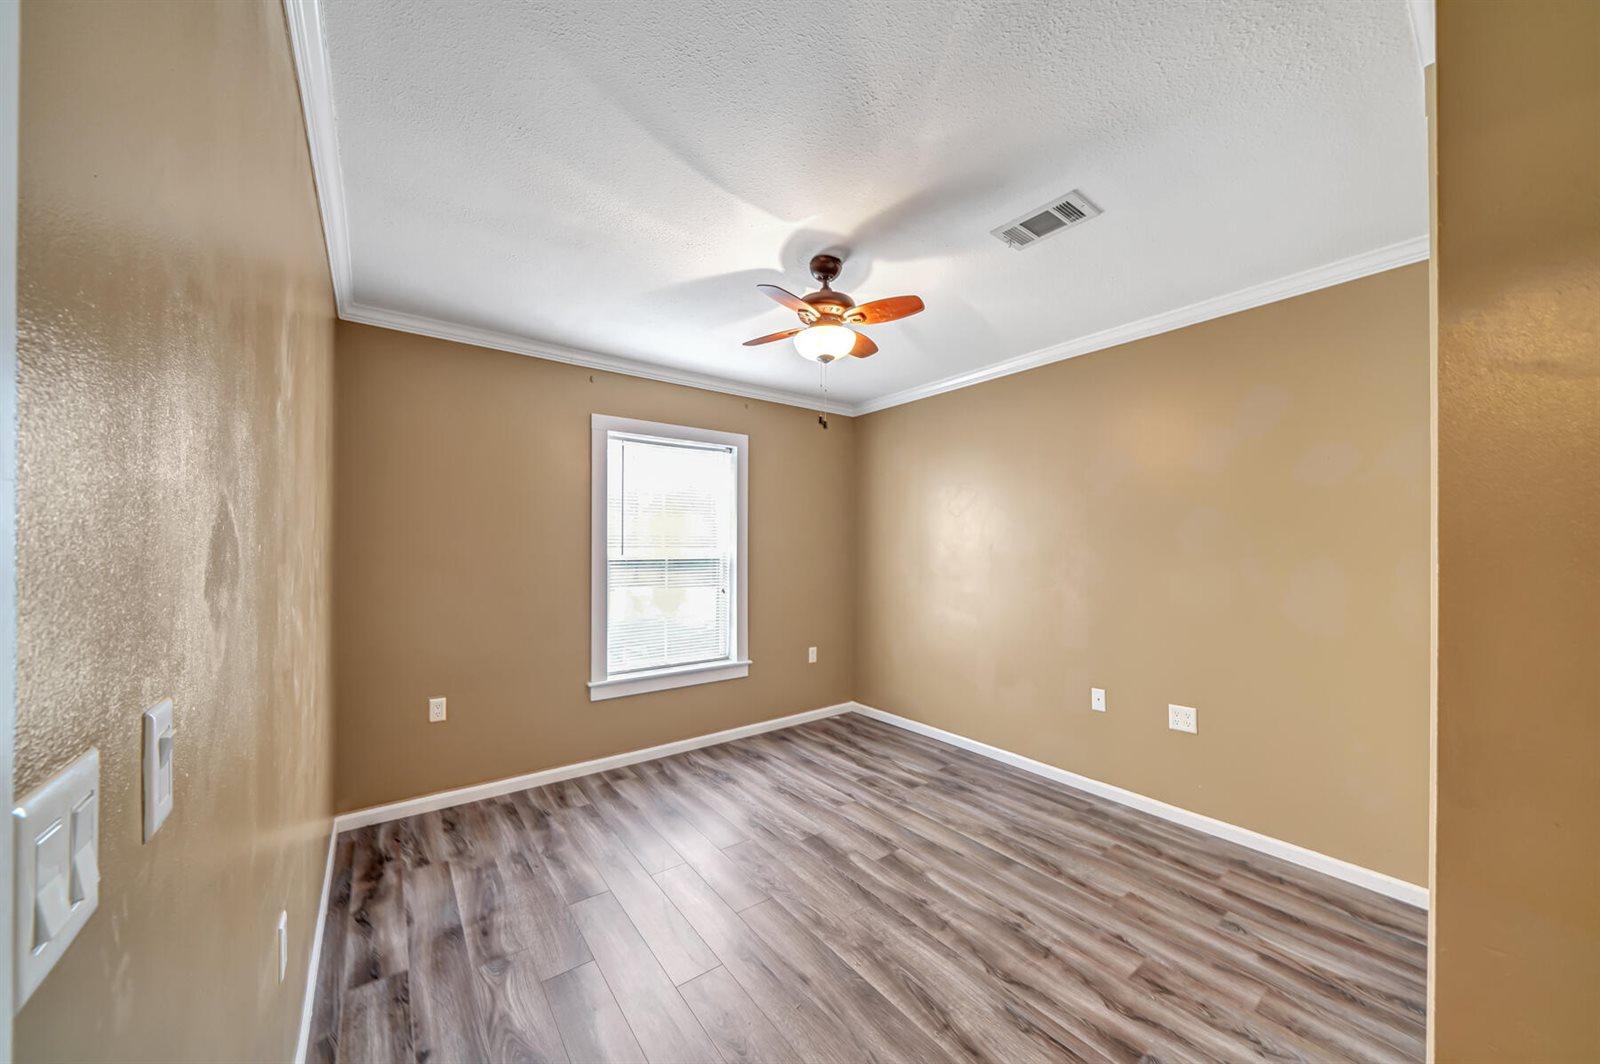 155_161 Caswell Branch Road, Freeport, FL 32439